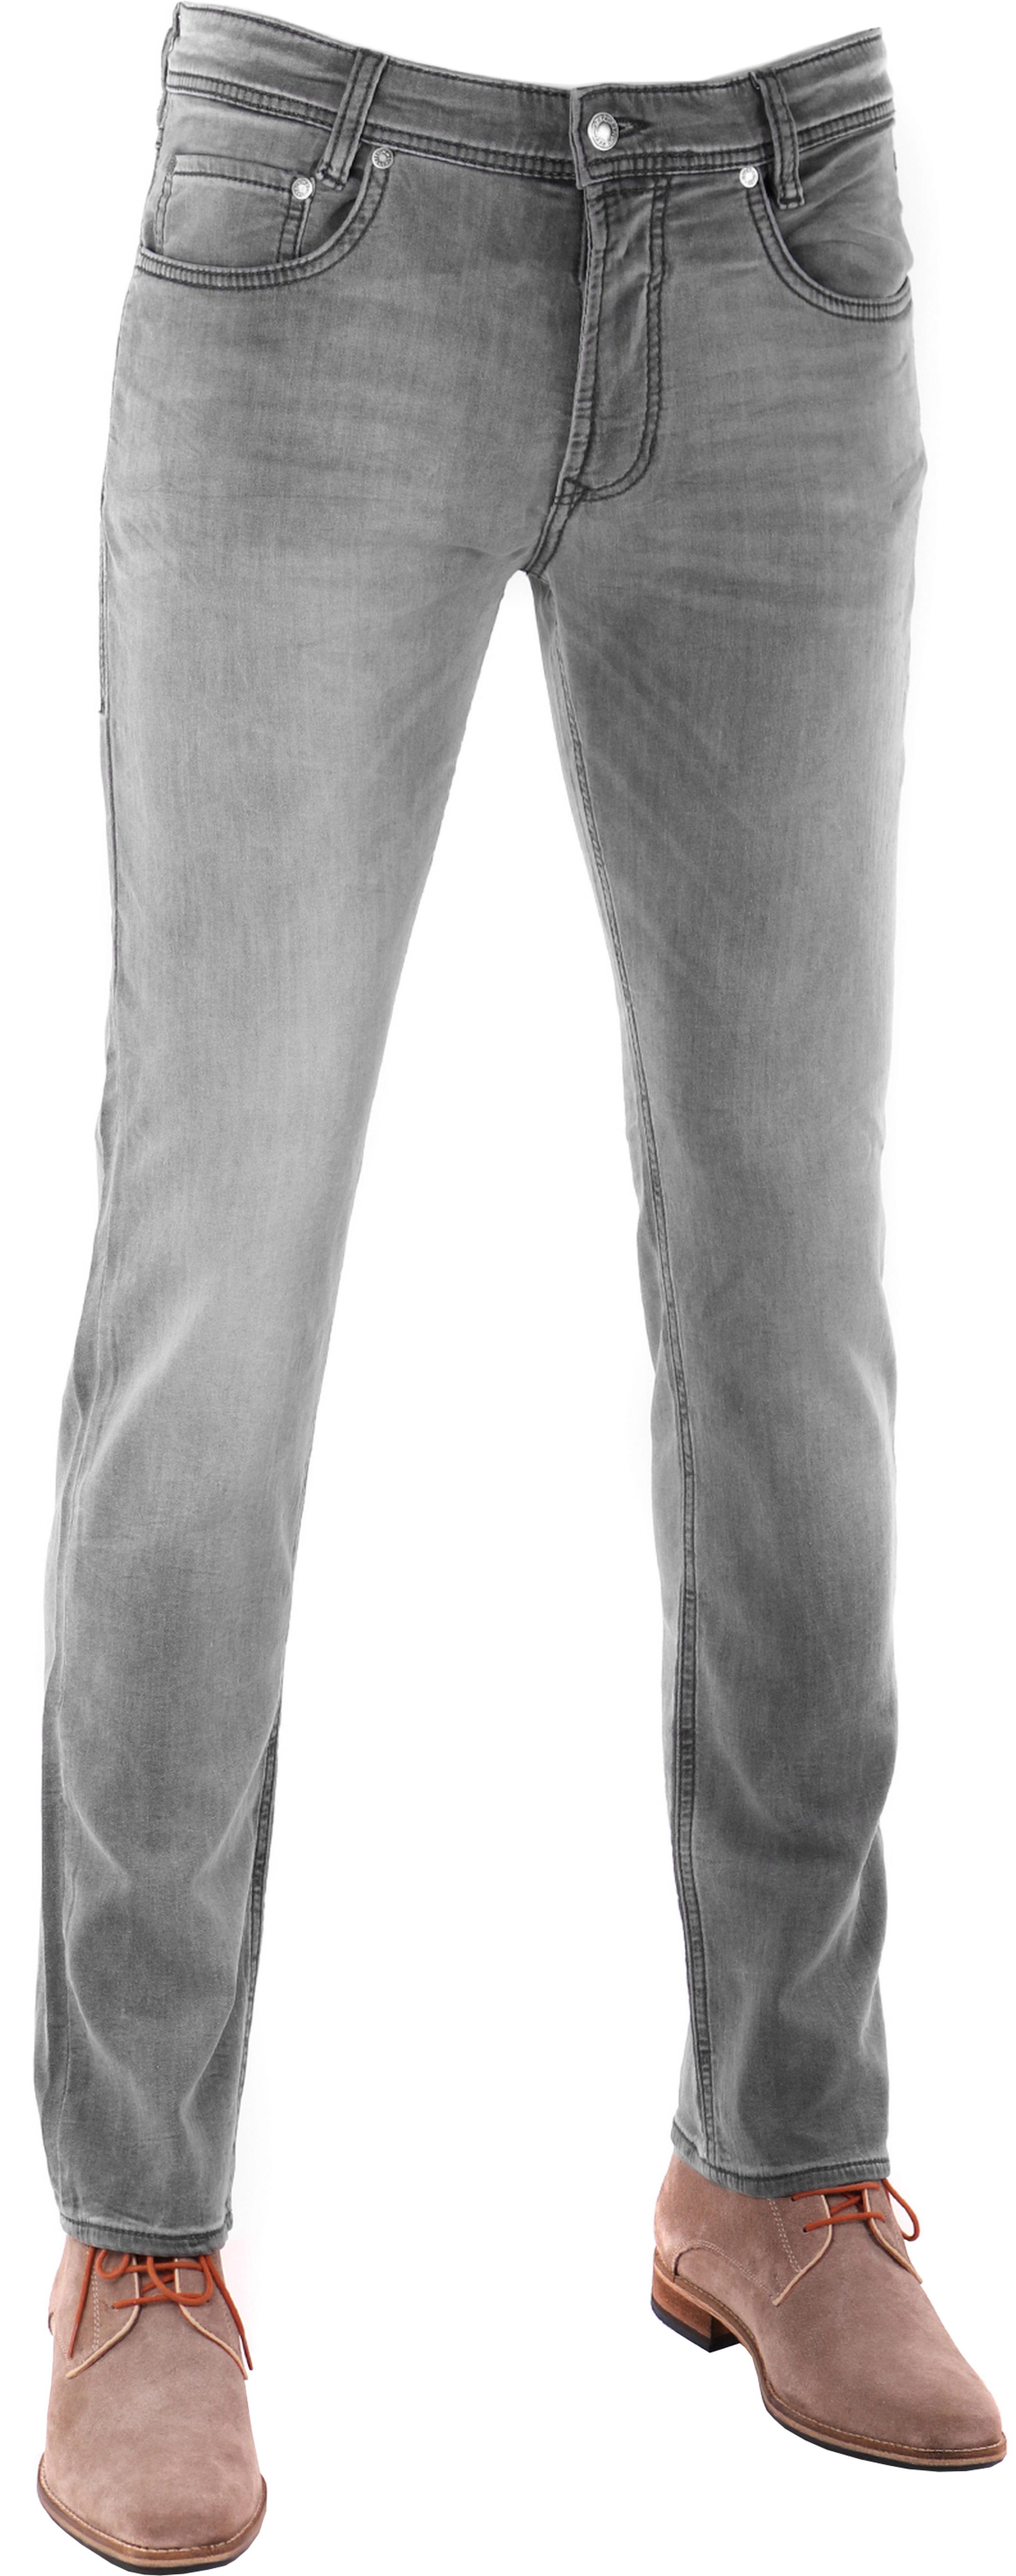 Mac Jog N Jeans Grey H825 foto 0